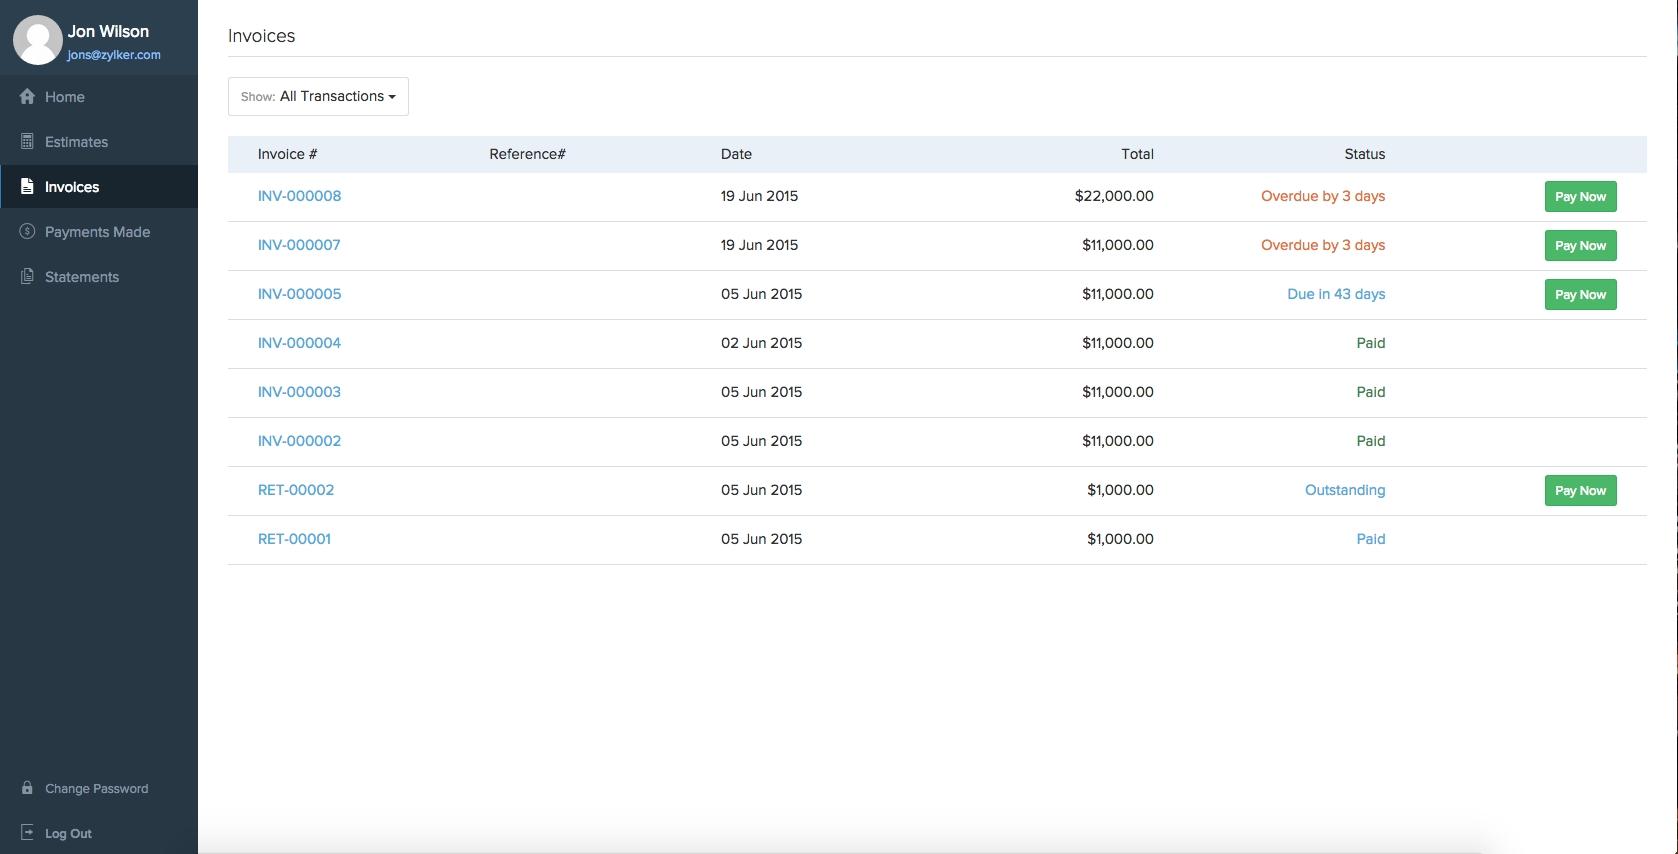 client portalhelp document type of invoice